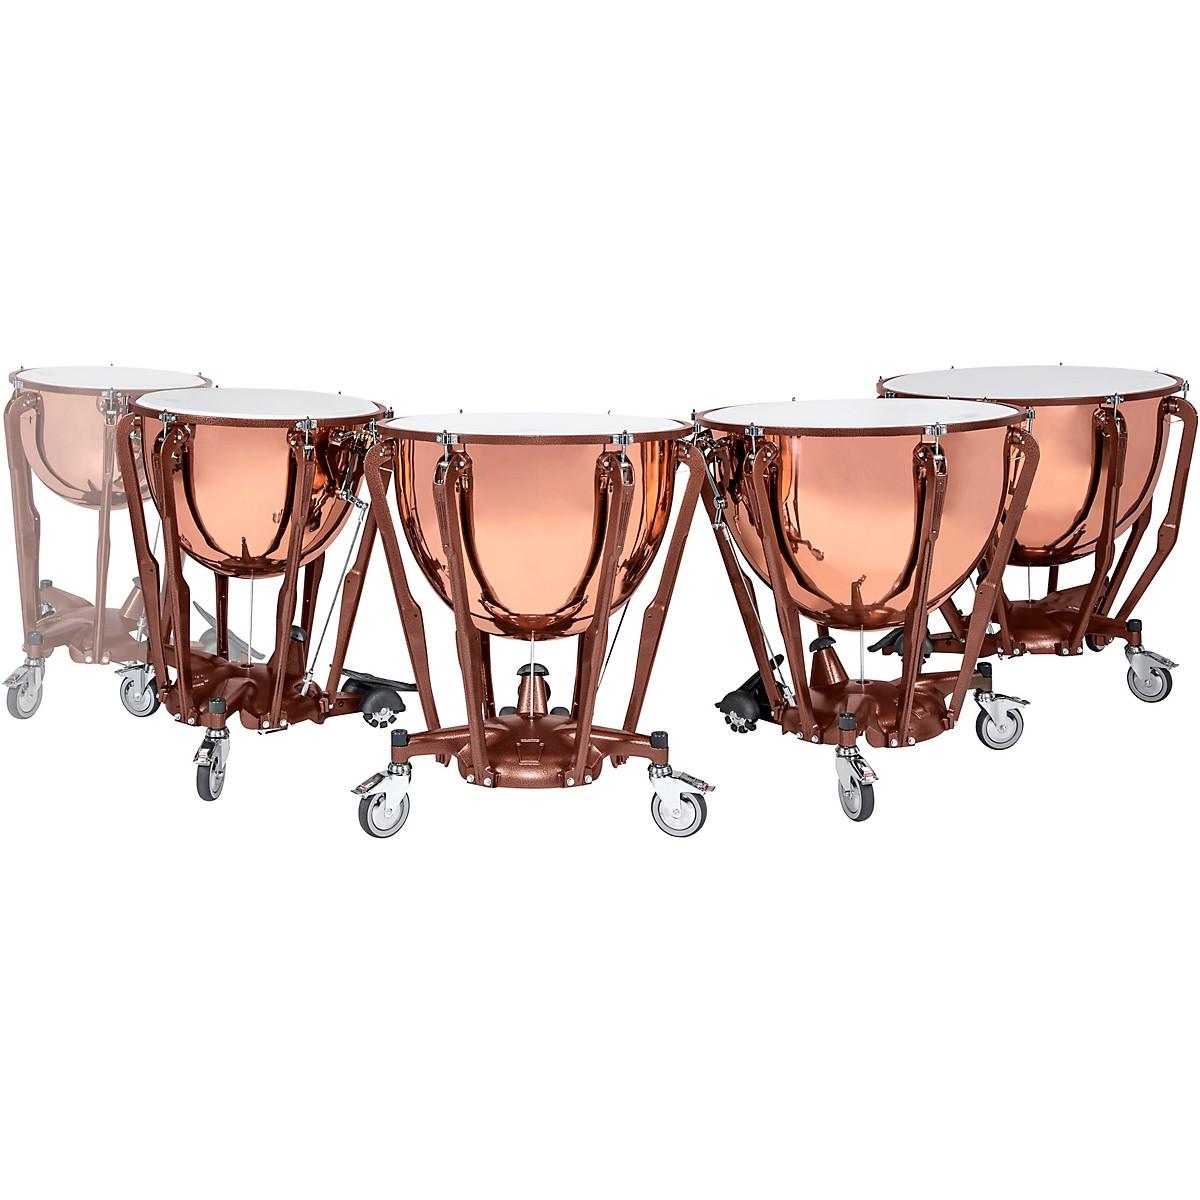 Ludwig Standard Series Polished Copper Timpani Set with Gauge